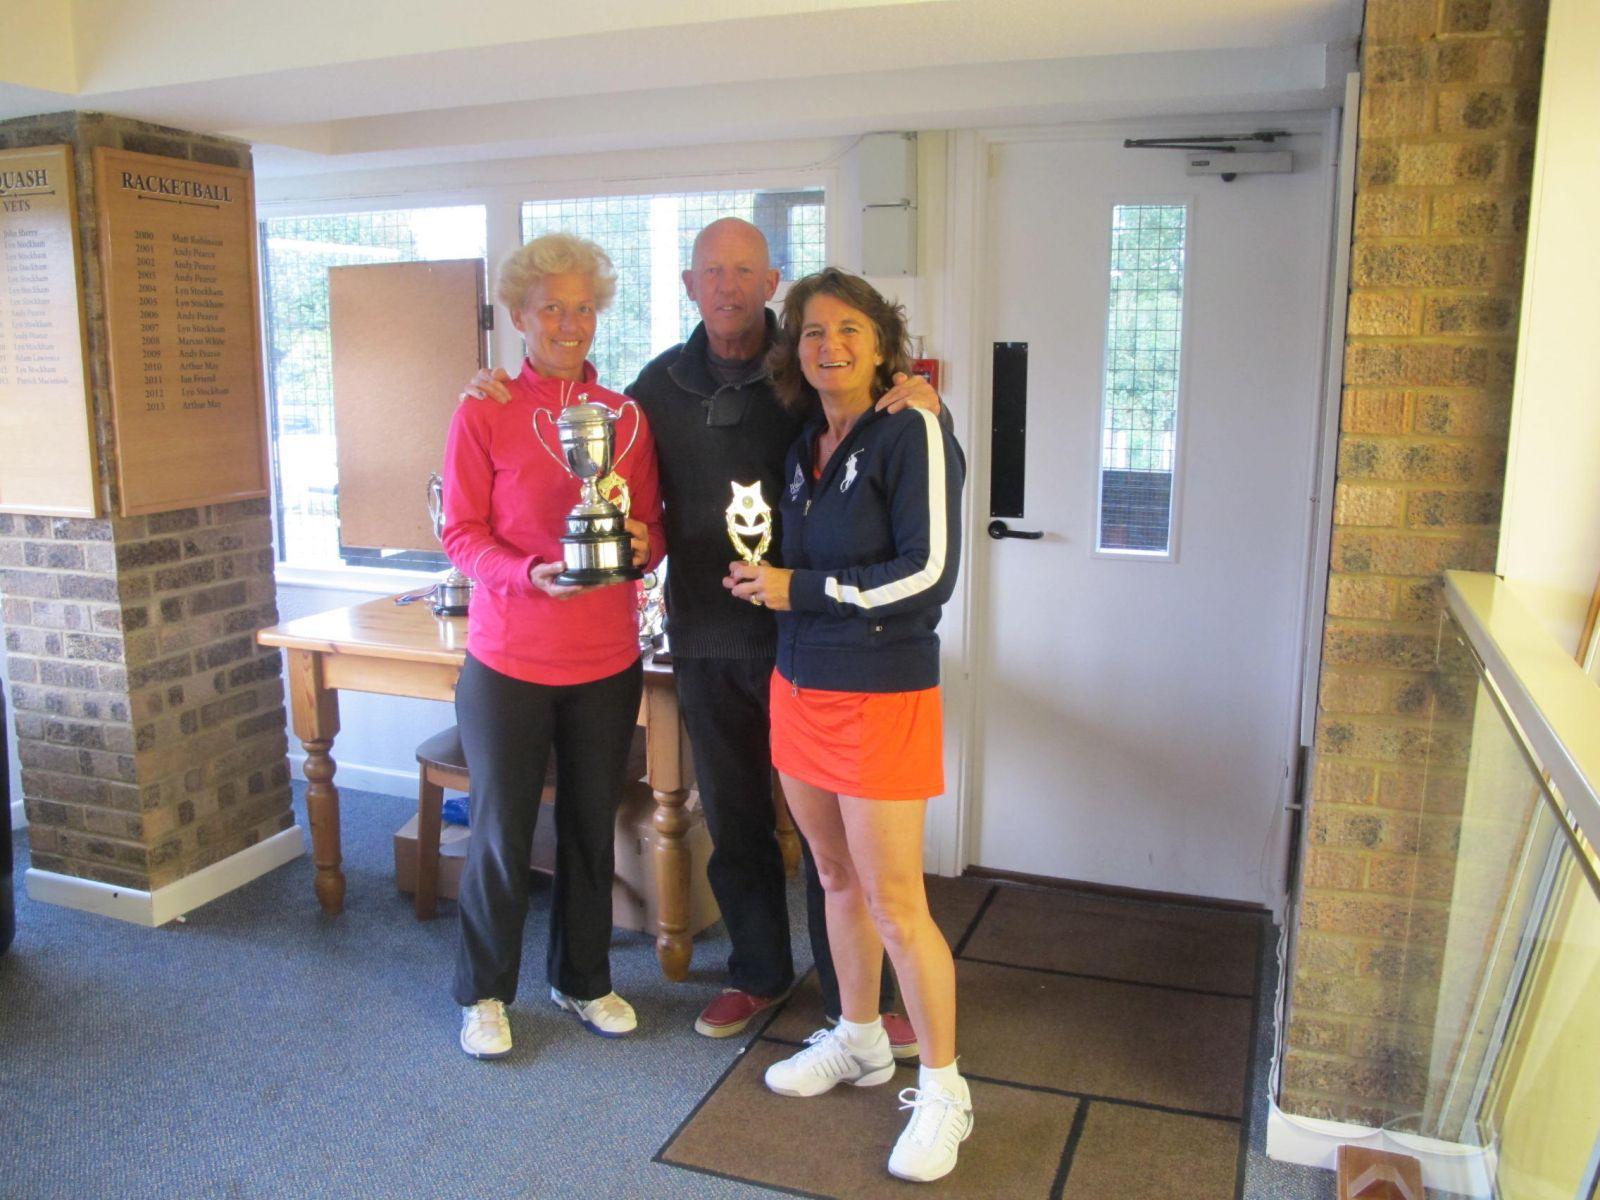 Yvonne Henderson & Sally Dinham-Scott, Ladies' Doubles Champions